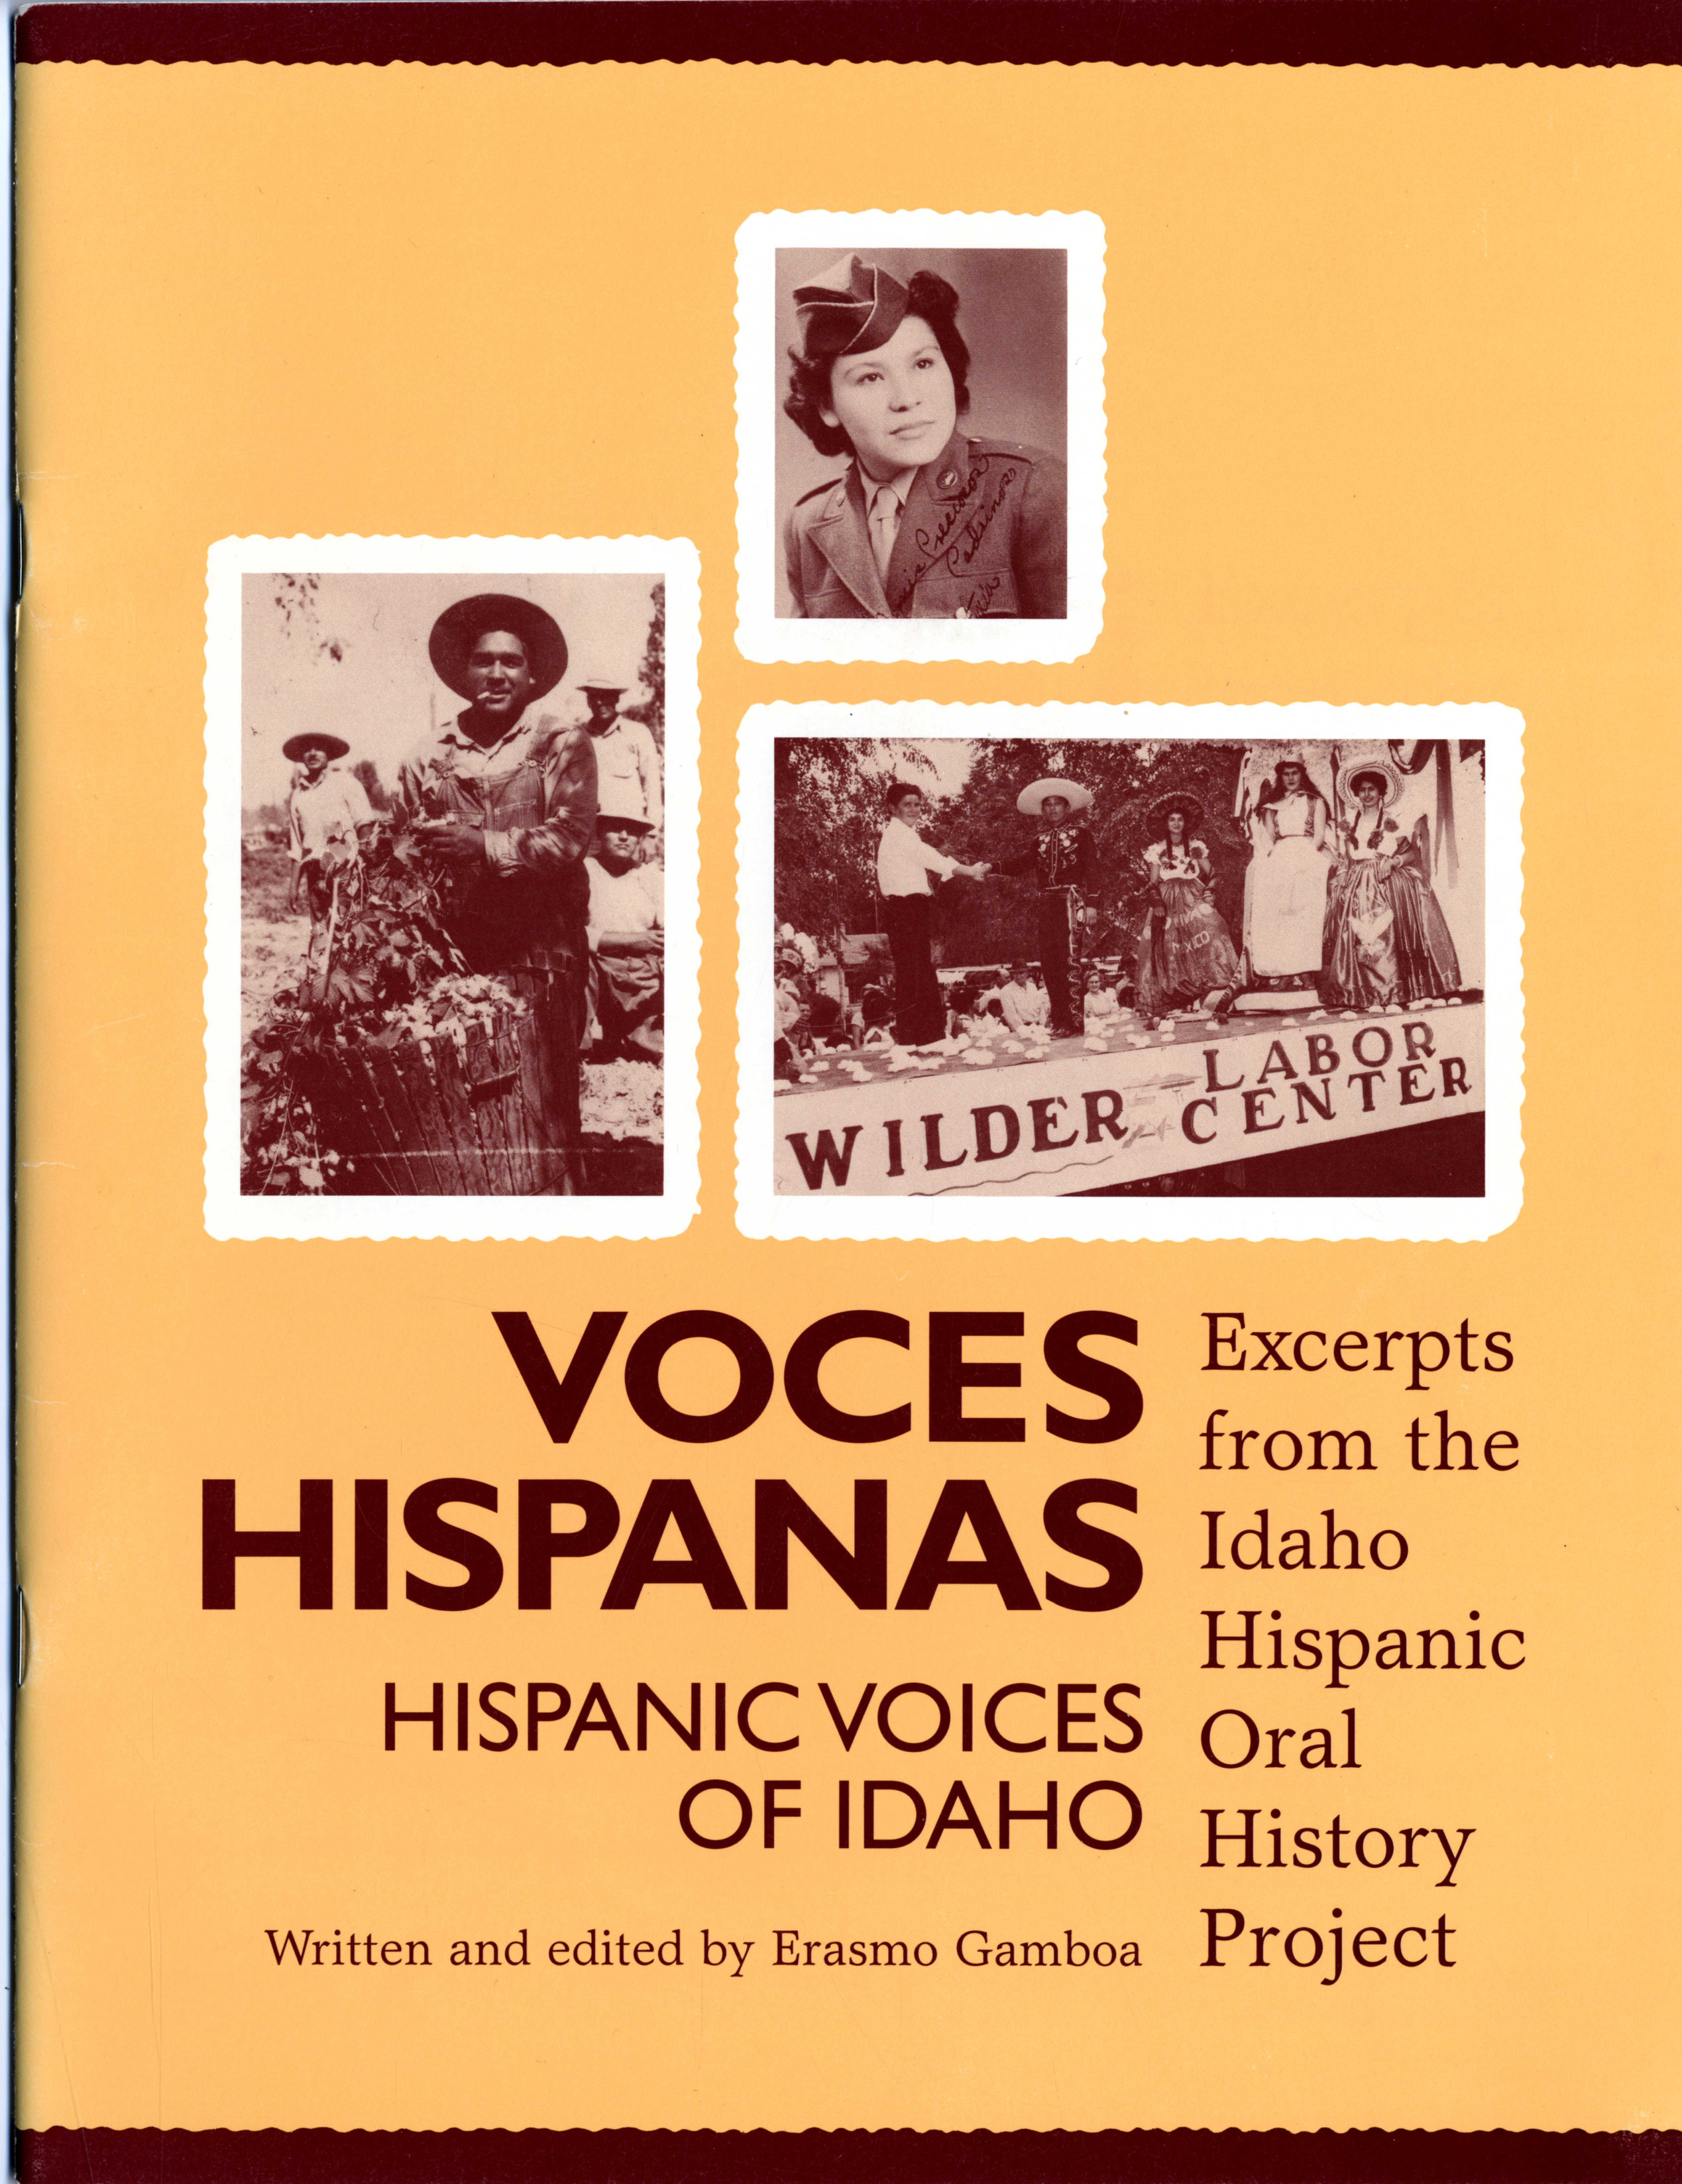 Preview image for Voces Hispanas - Hispanic Voices of Idaho